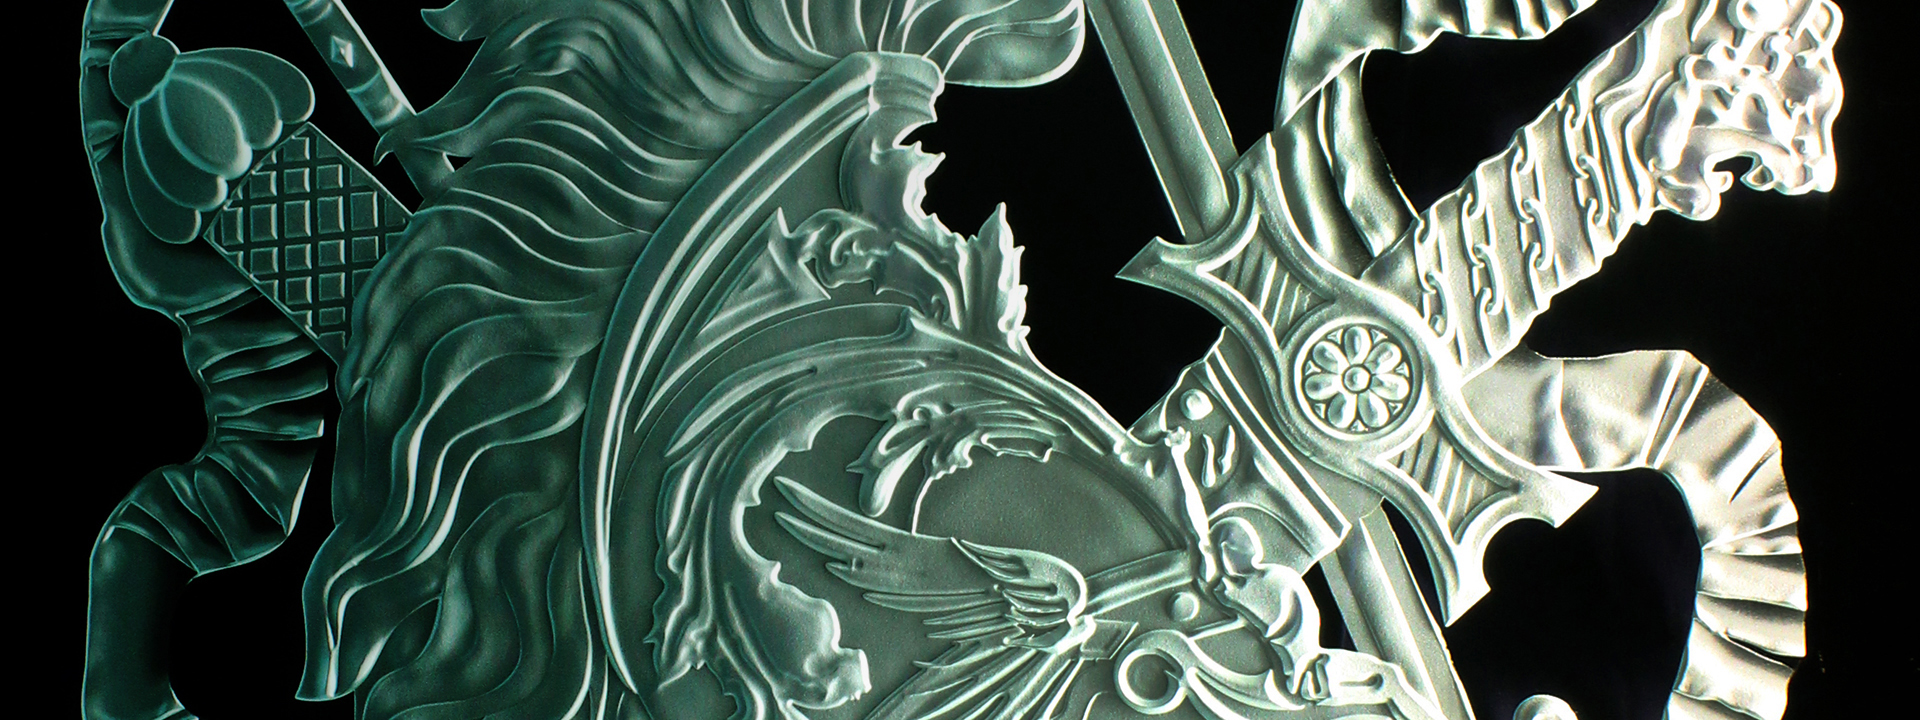 GlassGraphics_GlassCarvings04_v4